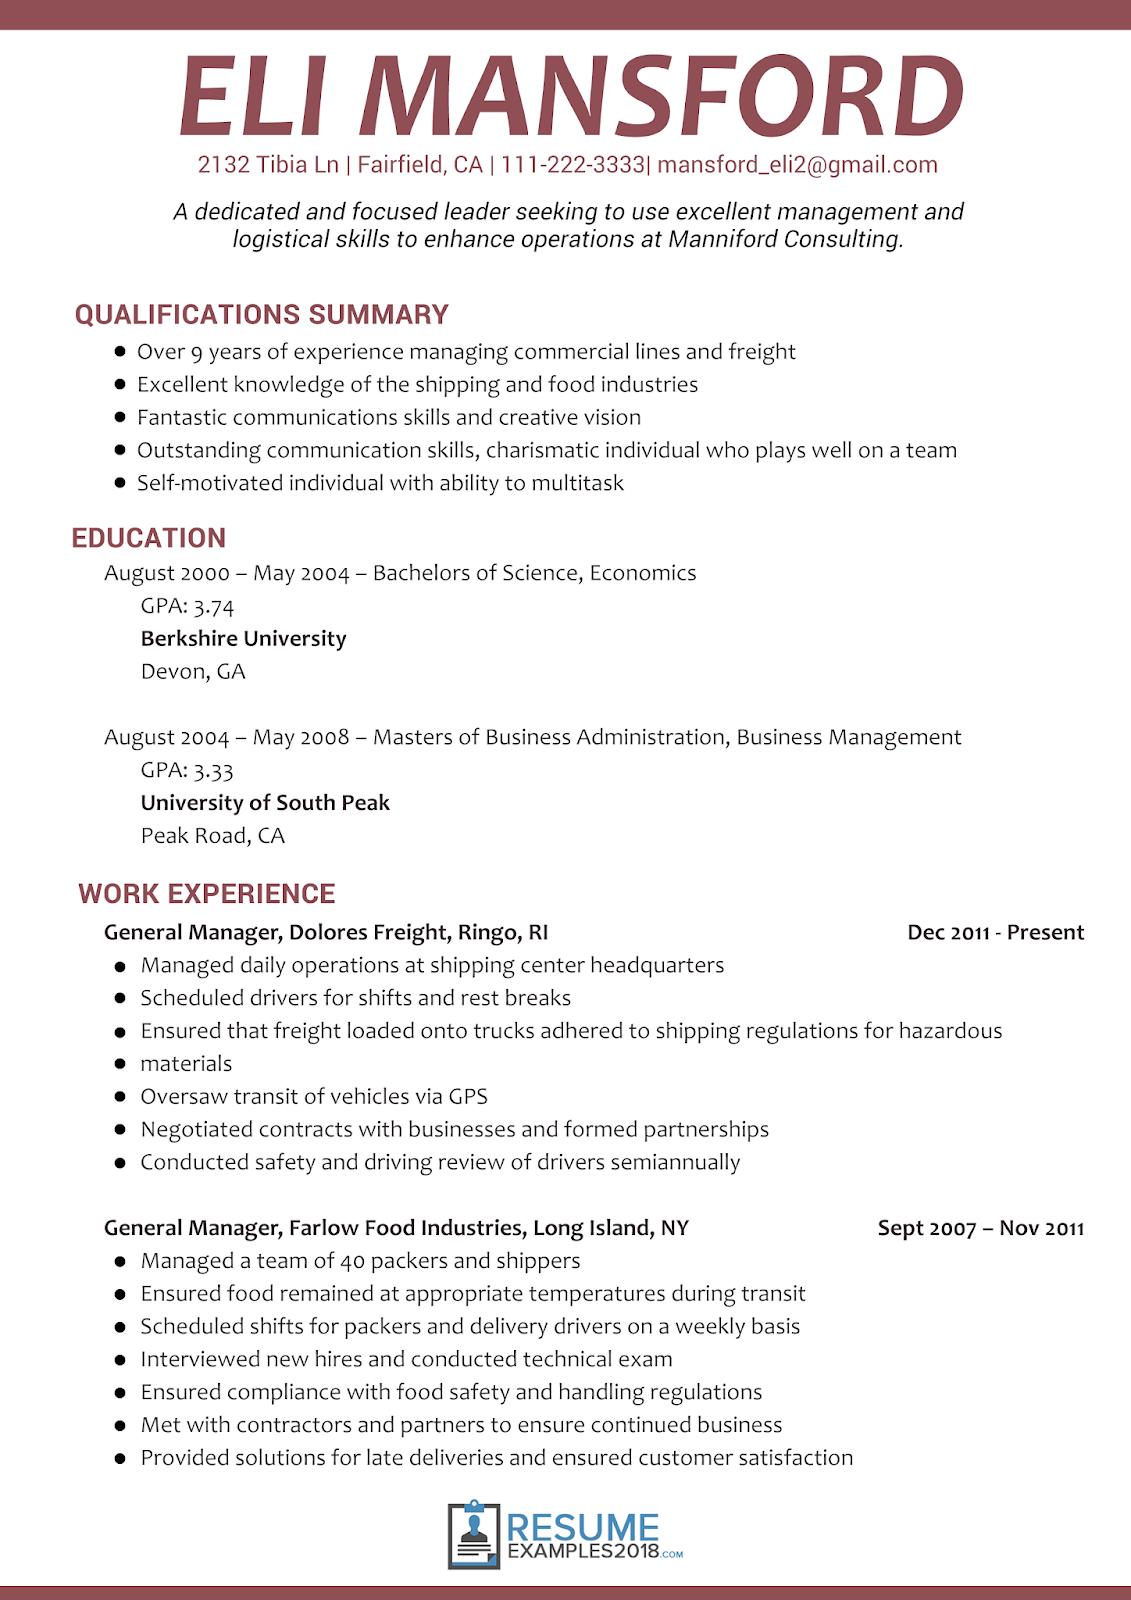 executive resume samples, executive resume samples 2019, executive resume samples word, executive resume samples pdf, executive resume samples 2018, executive resume samples 2017, executive resume samples, executive resume samples 2020, executive resume samples 2020, executive resume samples linkedin, executive resume samples free